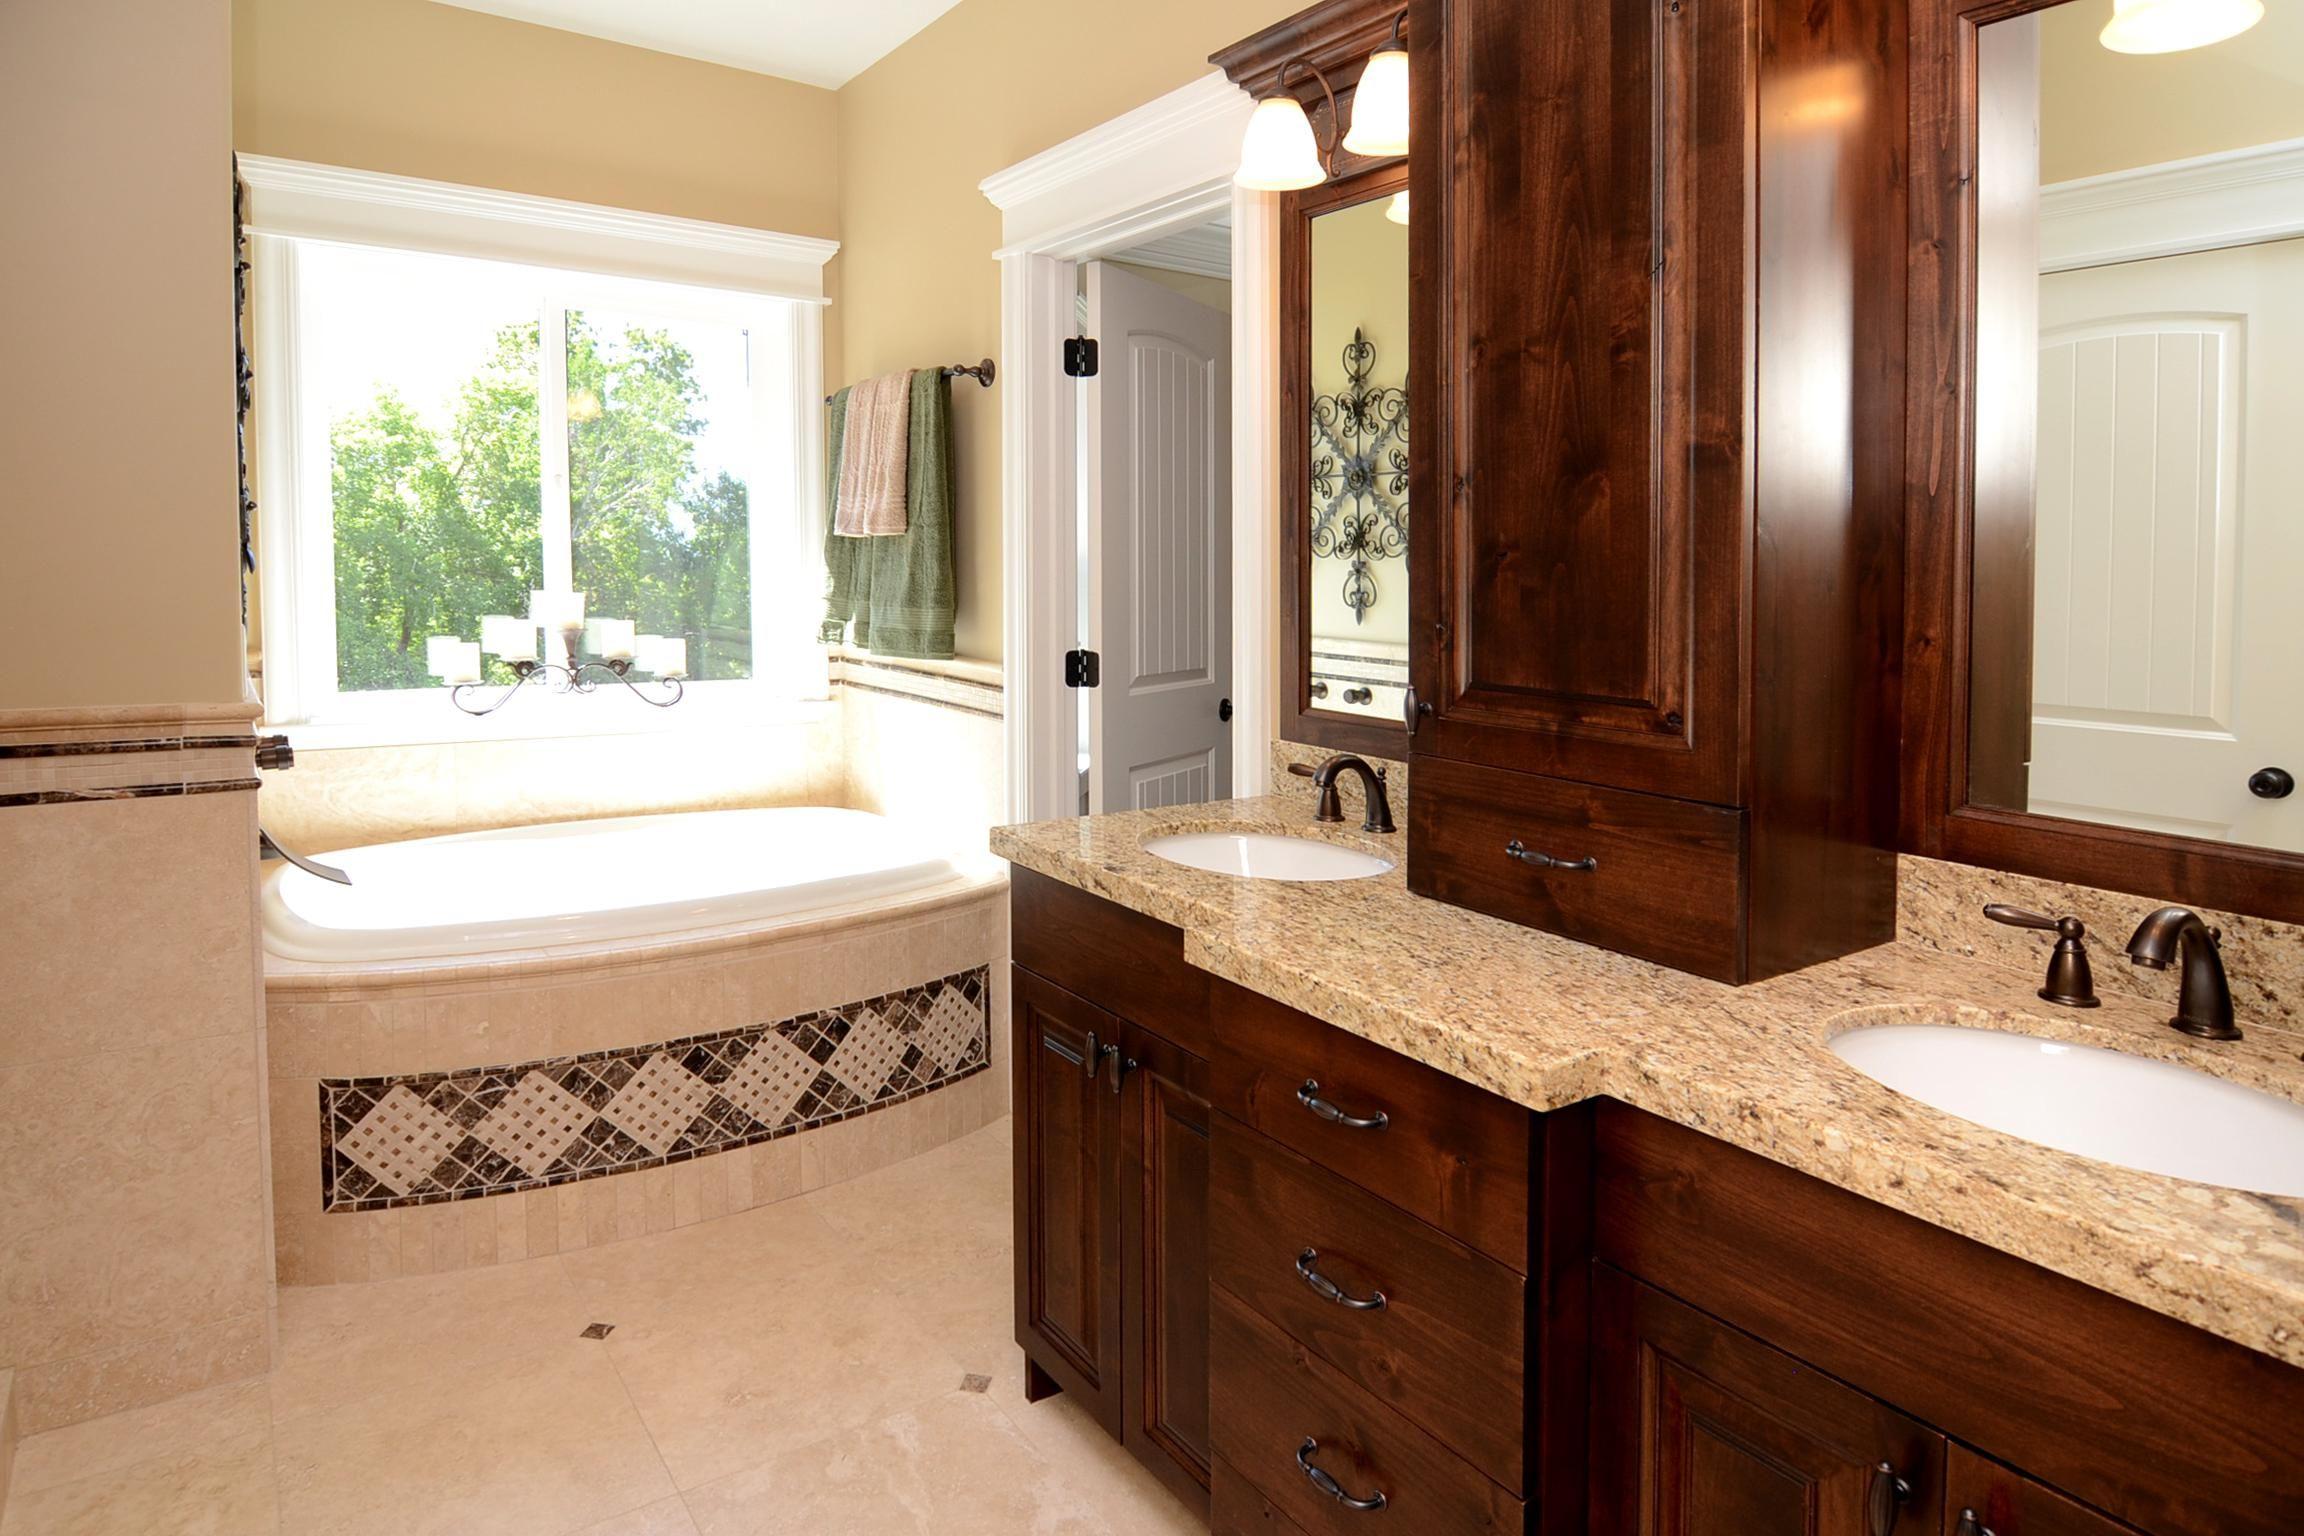 Uncategorized Bathtub Deck Ideas ceramic drop in bathtub deck wall mounted flush toilet white wooden door design elongated toilet